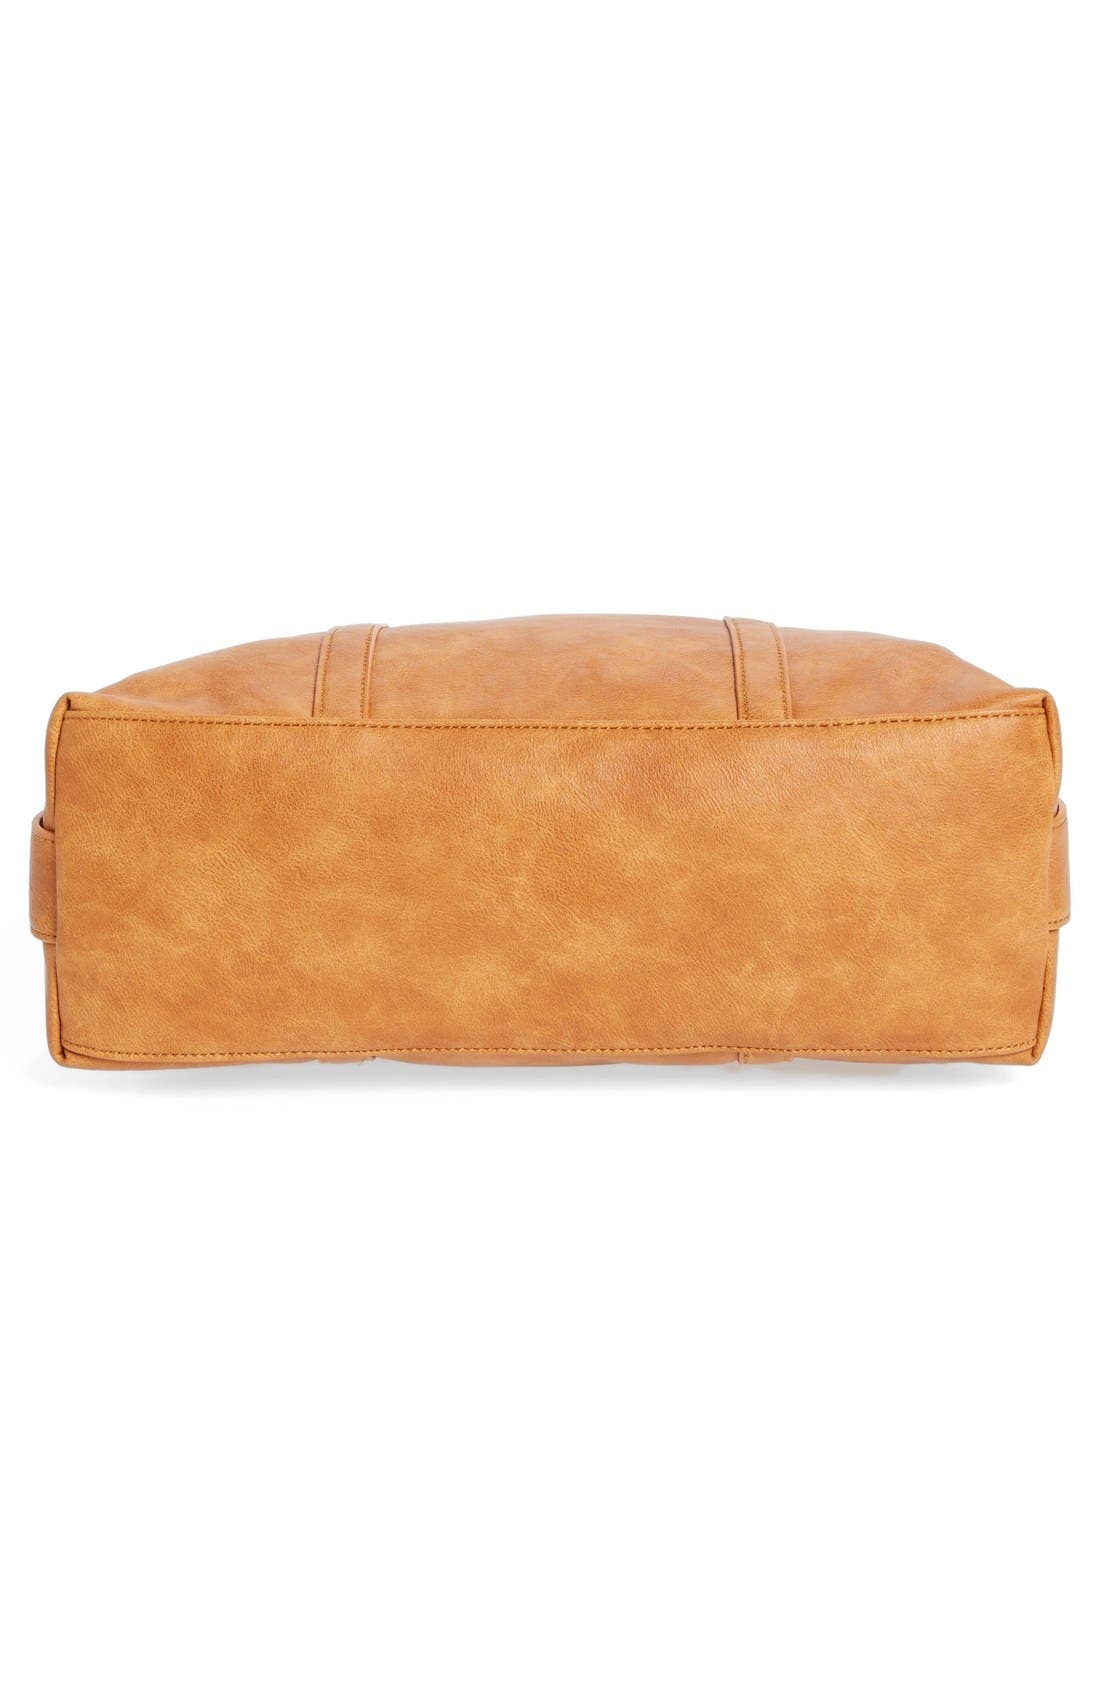 'Oliva' Faux Leather Satchel,                             Alternate thumbnail 6, color,